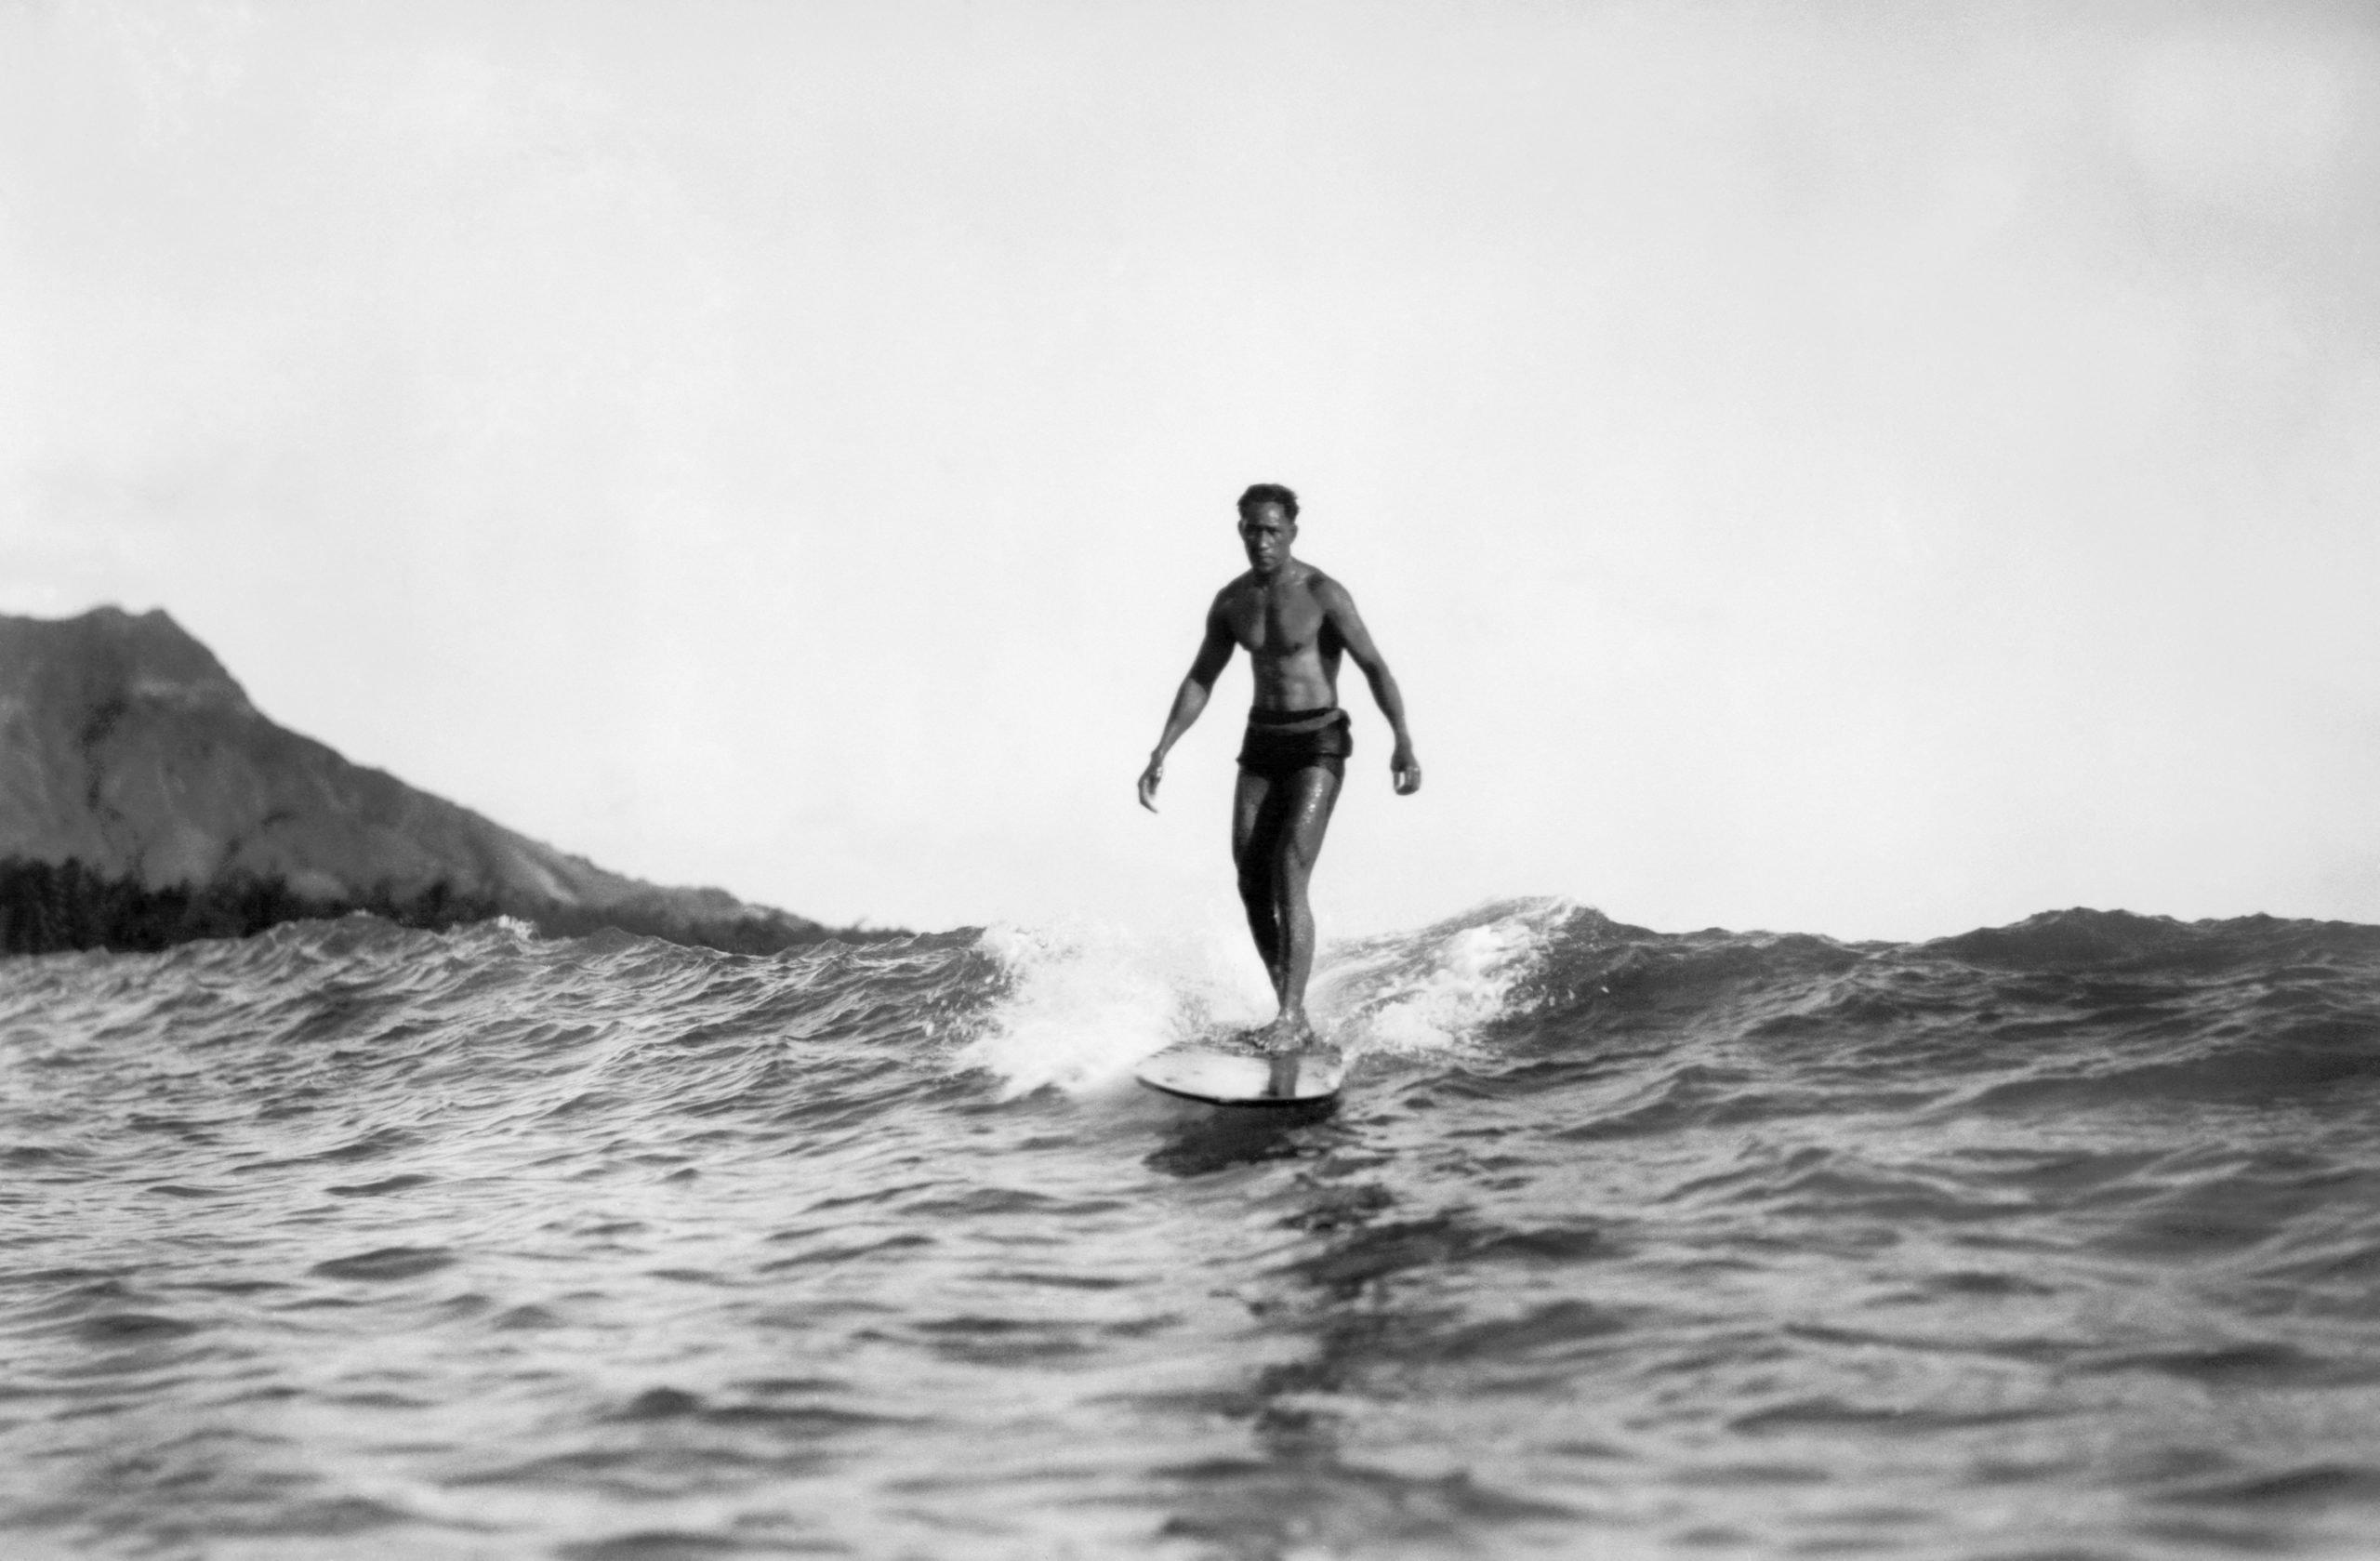 Possibly Duke Kahanamoku Surfing At Waikiki Beach